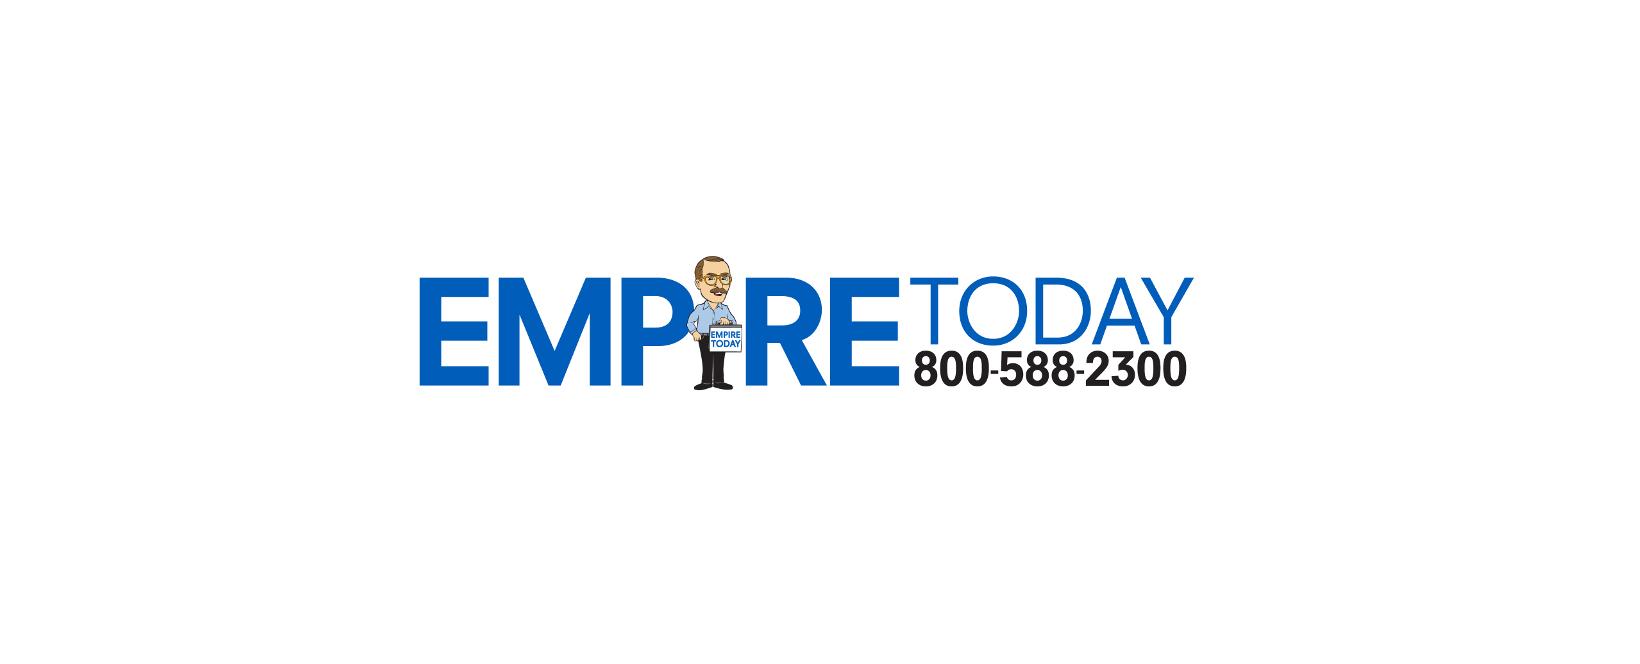 Empire Today Discount Code 2021